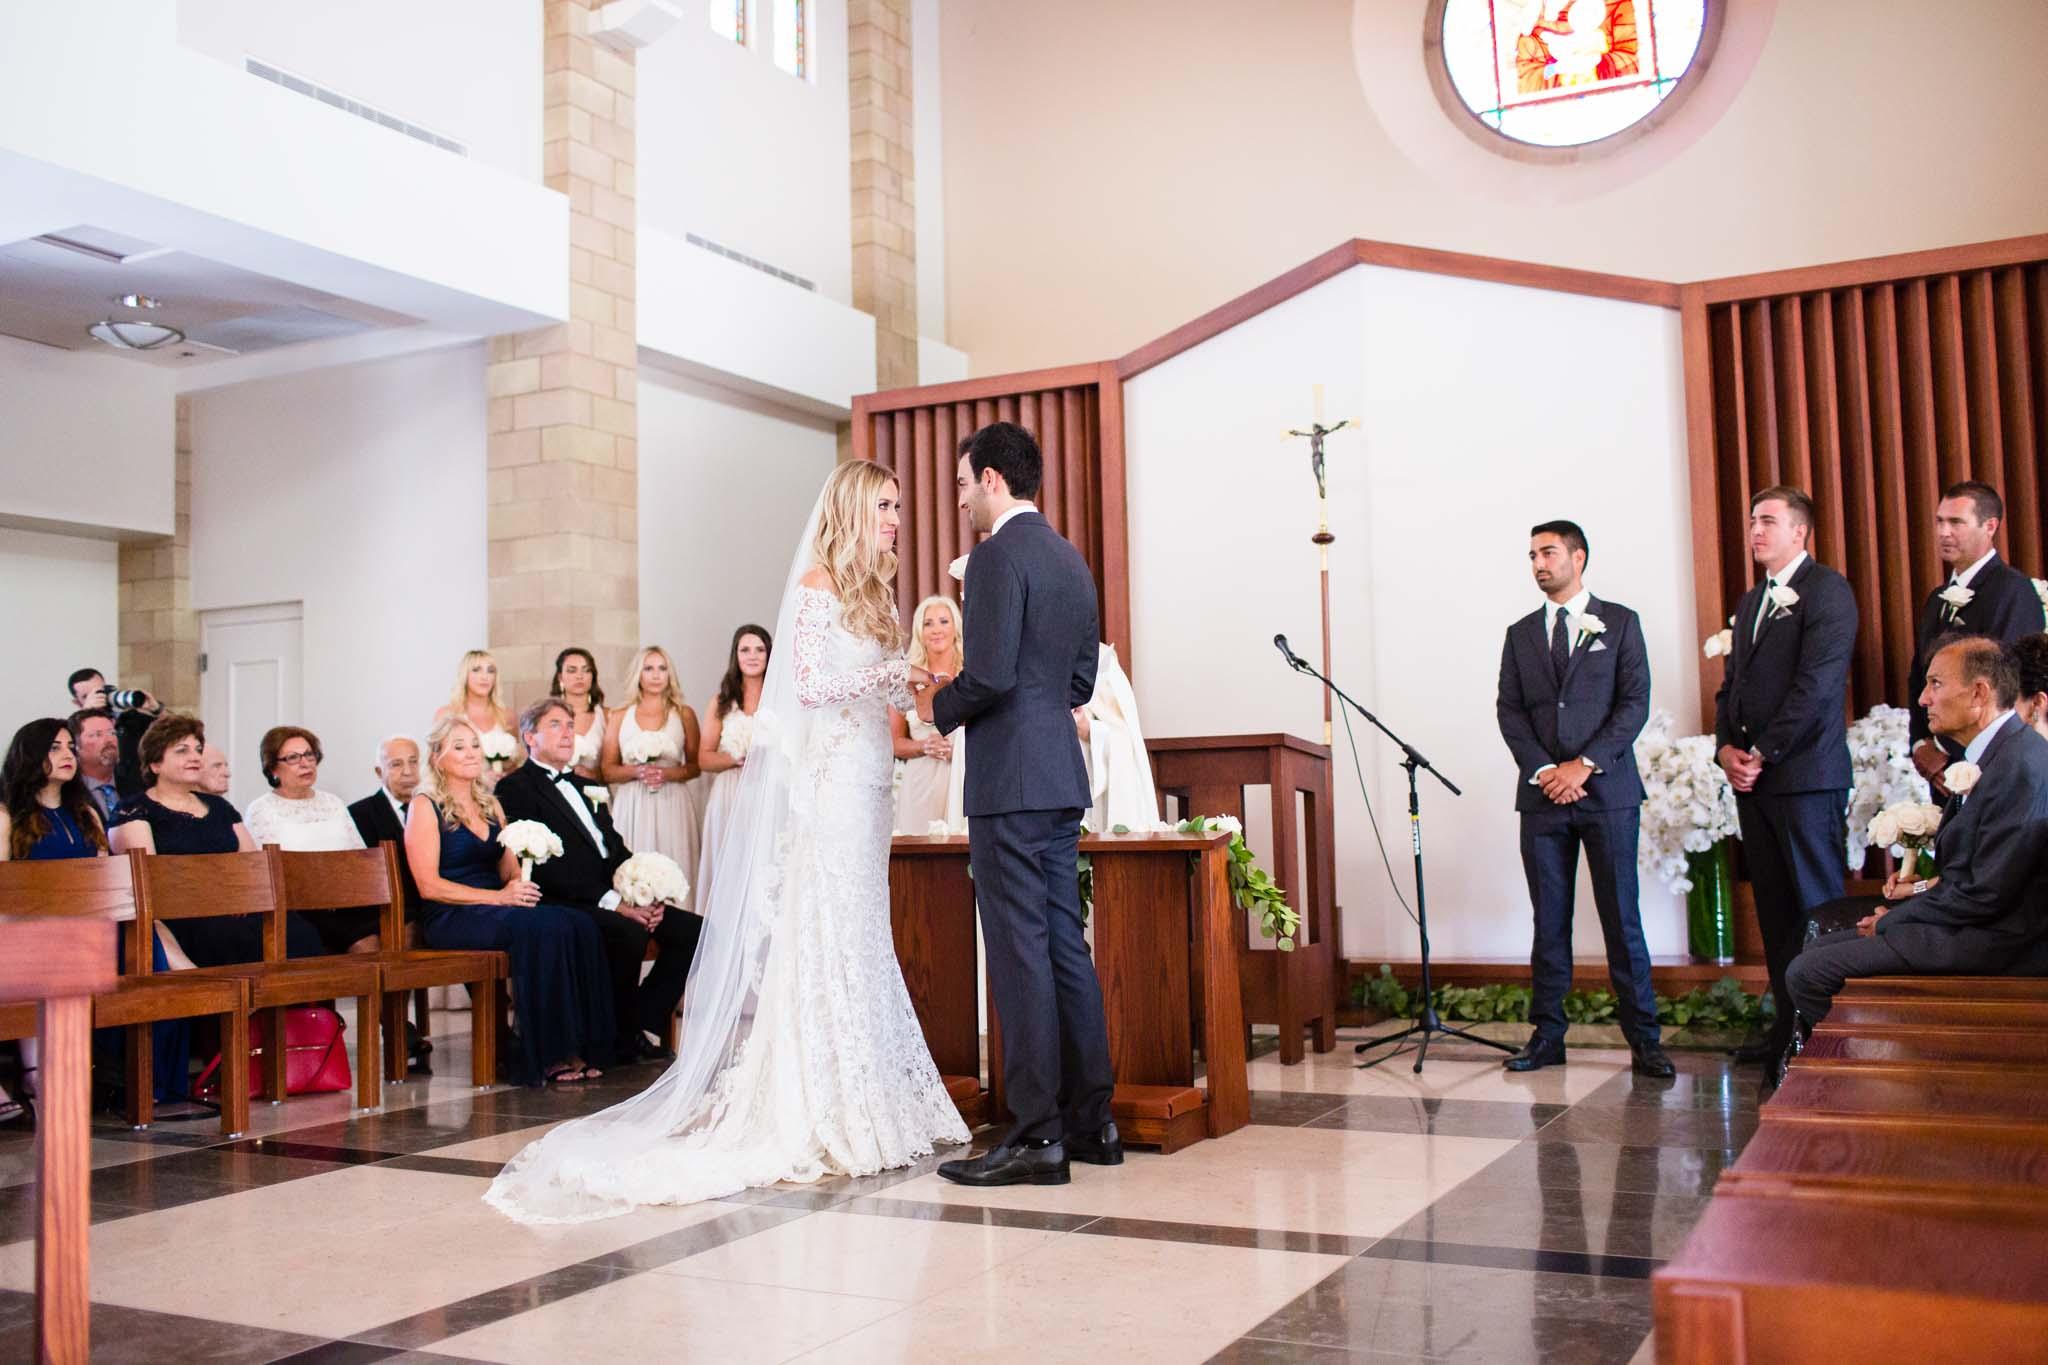 rancho_santa_fe_estate_wedding_046.jpg